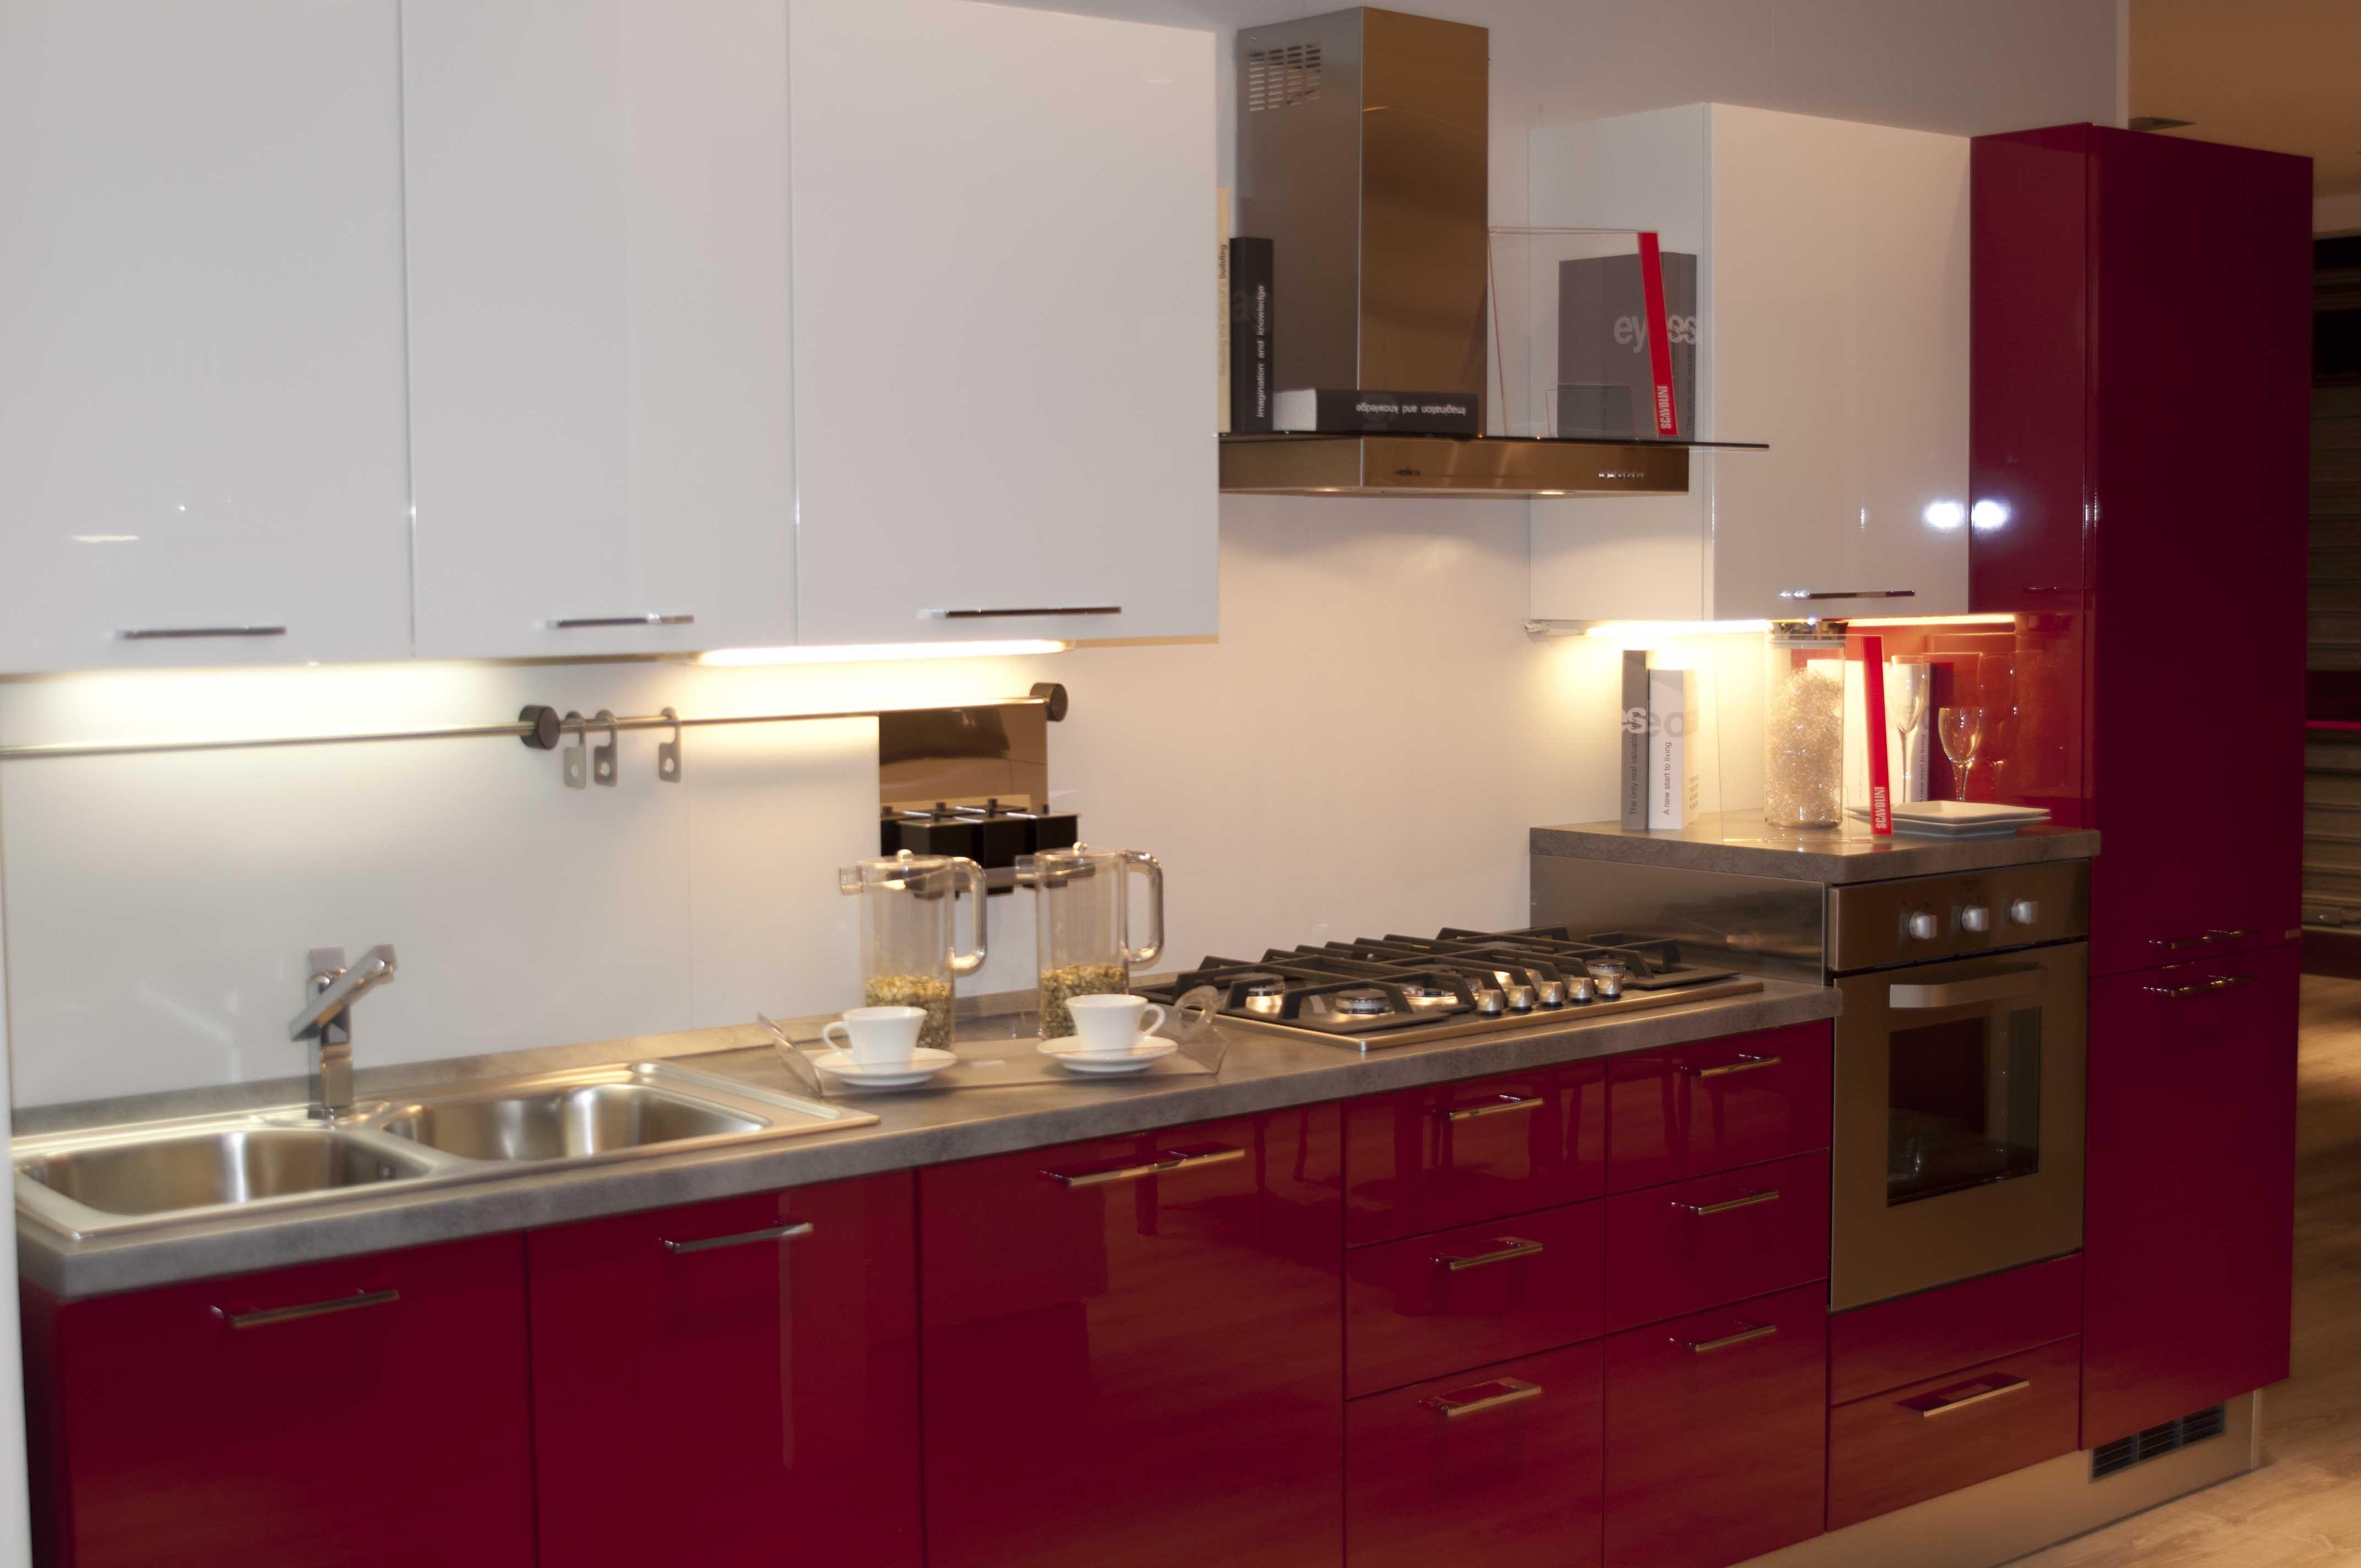 Cucina bianca e rossa Scavolini | Foggia | Home sweet home ...